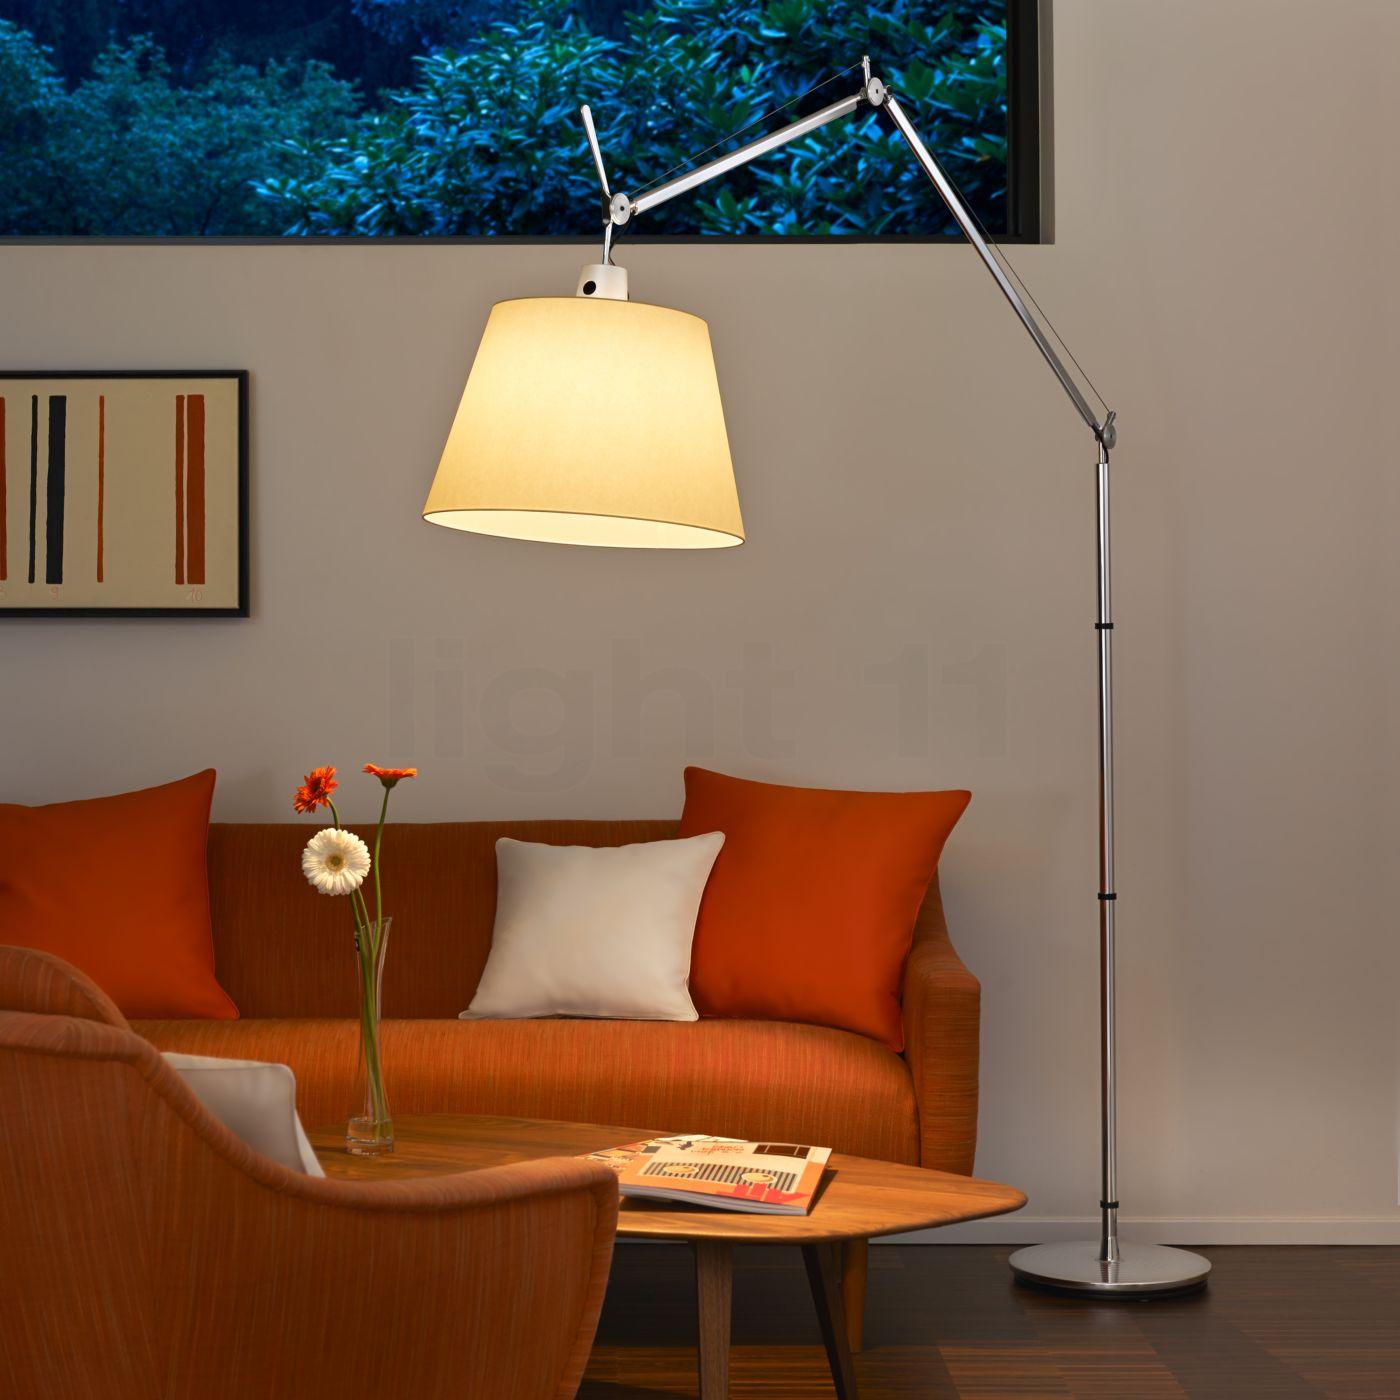 artemide tolomeo terra floor tolomeo mega terra mit dimmer kaufen bei lightde tolomeo floor. Black Bedroom Furniture Sets. Home Design Ideas